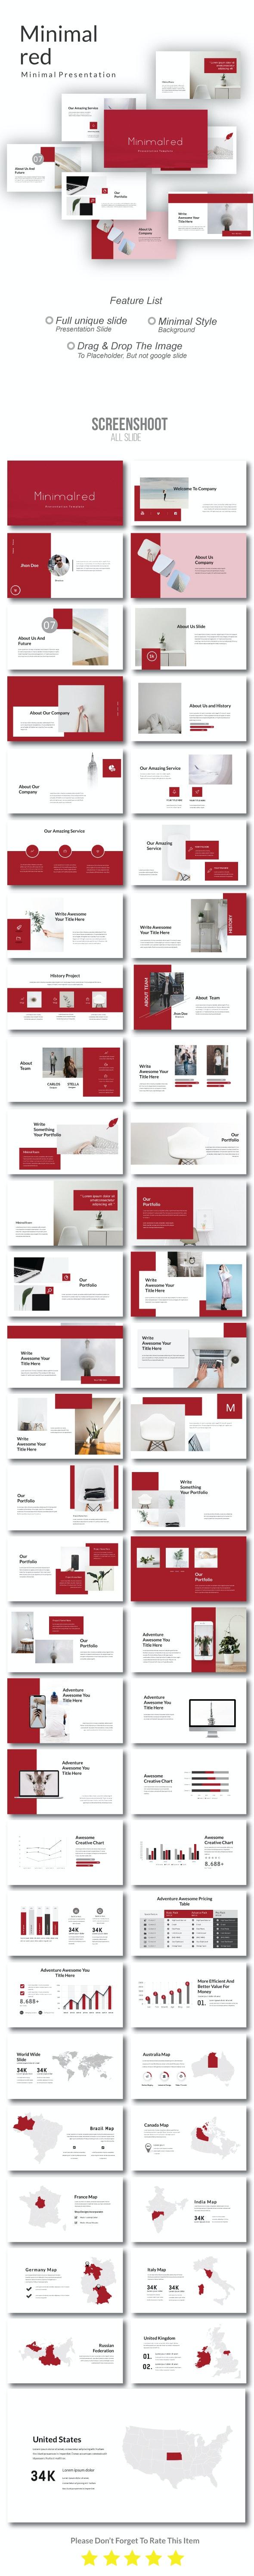 Minimalred Creative Google Slide - Creative PowerPoint Templates